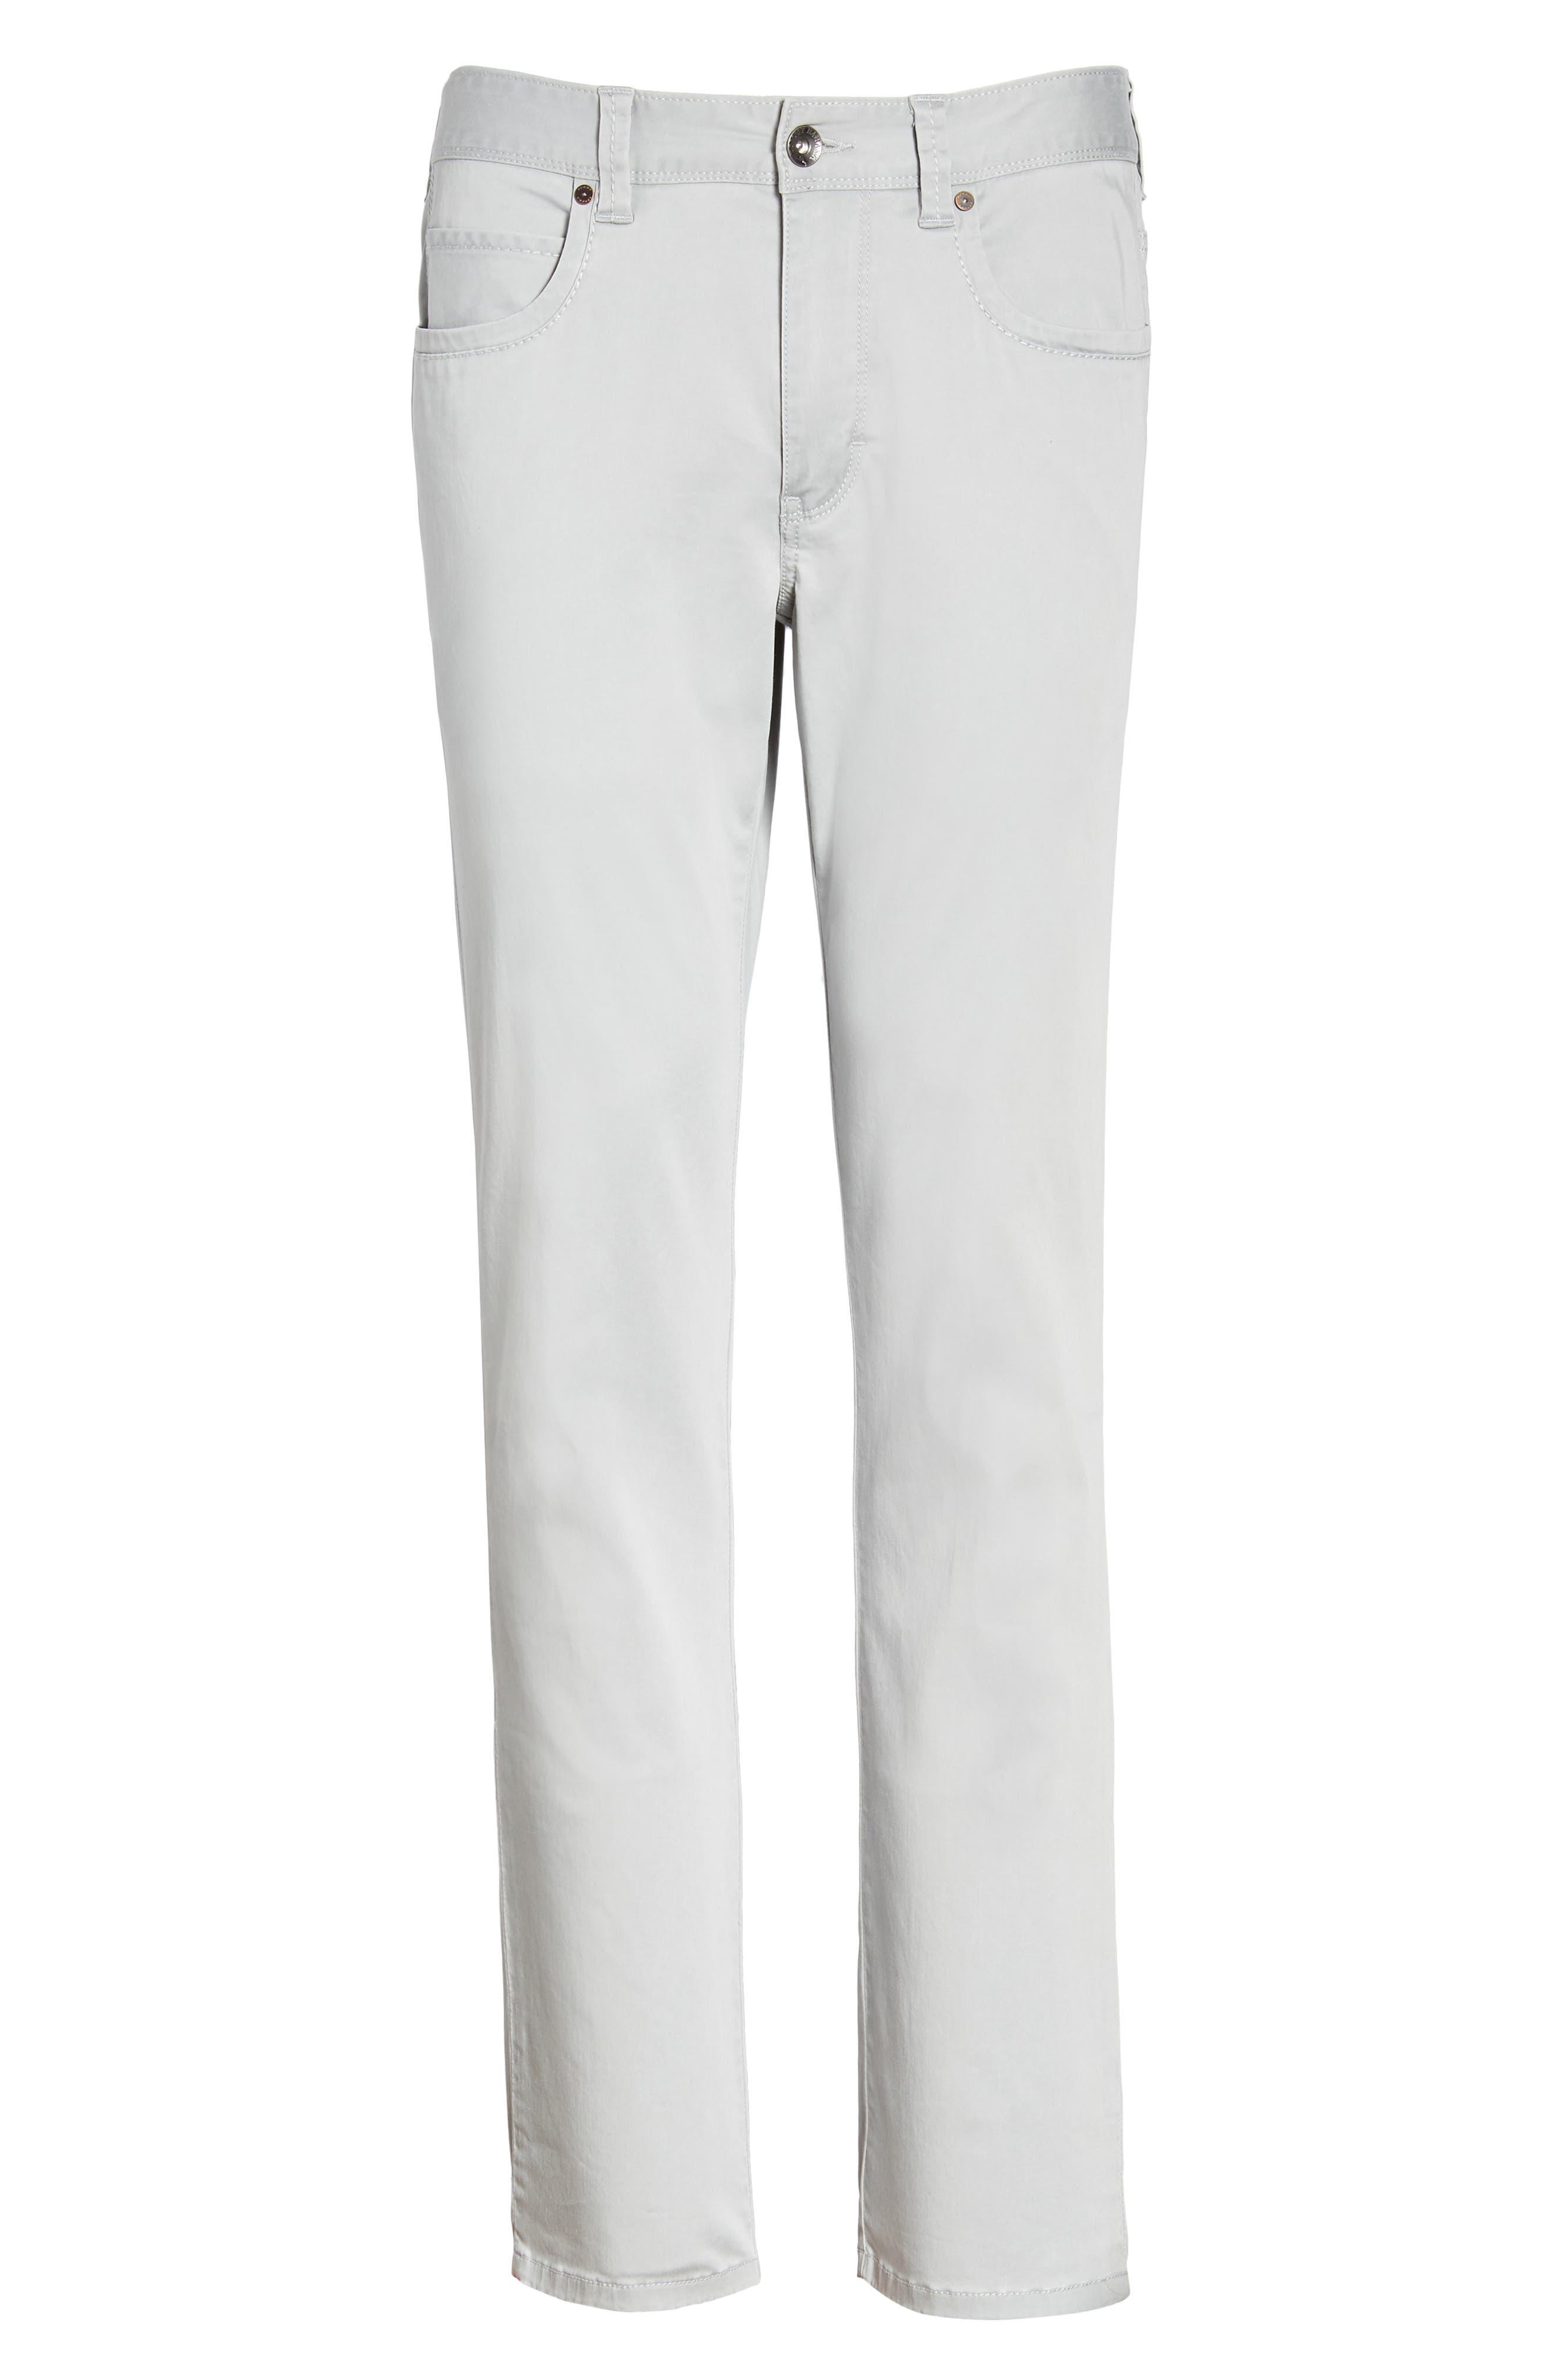 Boracay Pants,                             Alternate thumbnail 6, color,                             050